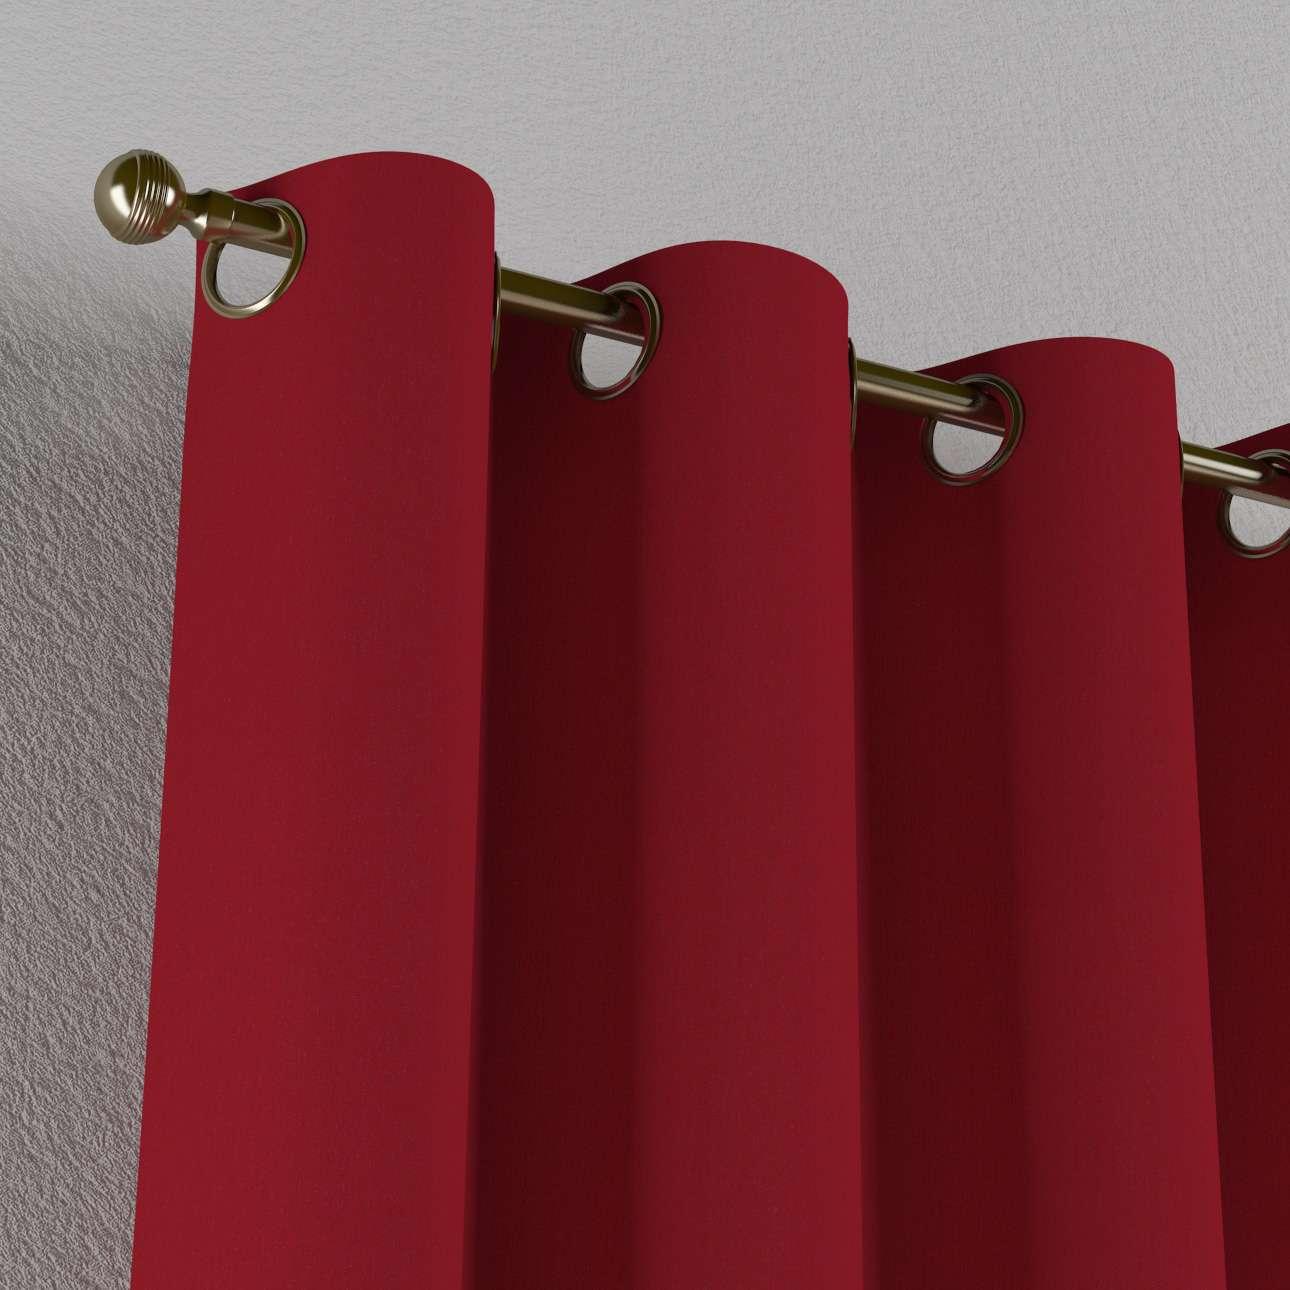 Gardin med øskner 130 × 260 cm fra kollektionen Chenille, Stof: 702-24